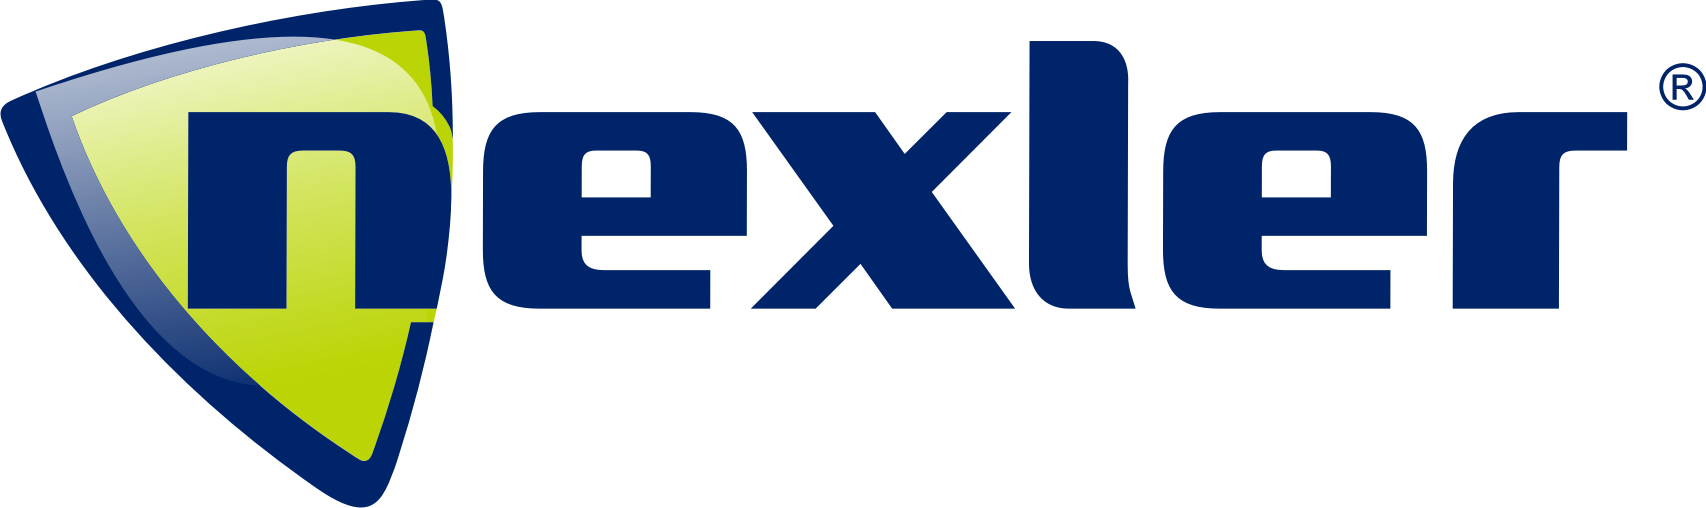 https://izohan.eu/wp-content/uploads/logotypy/nexler_logo.png